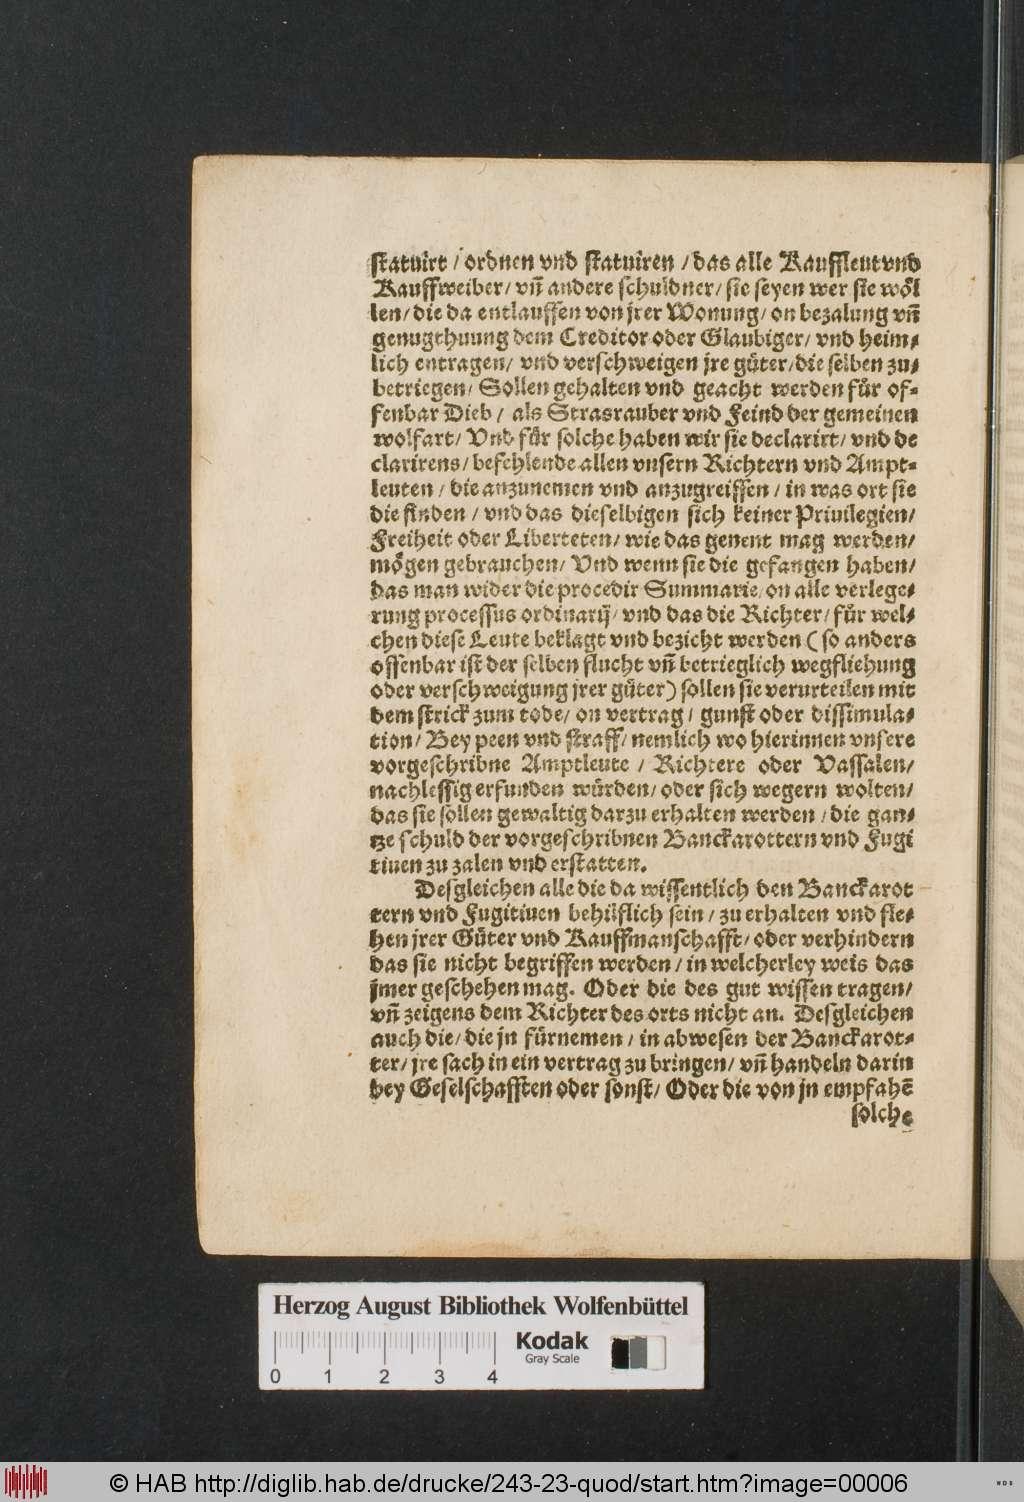 http://diglib.hab.de/drucke/243-23-quod/00006.jpg